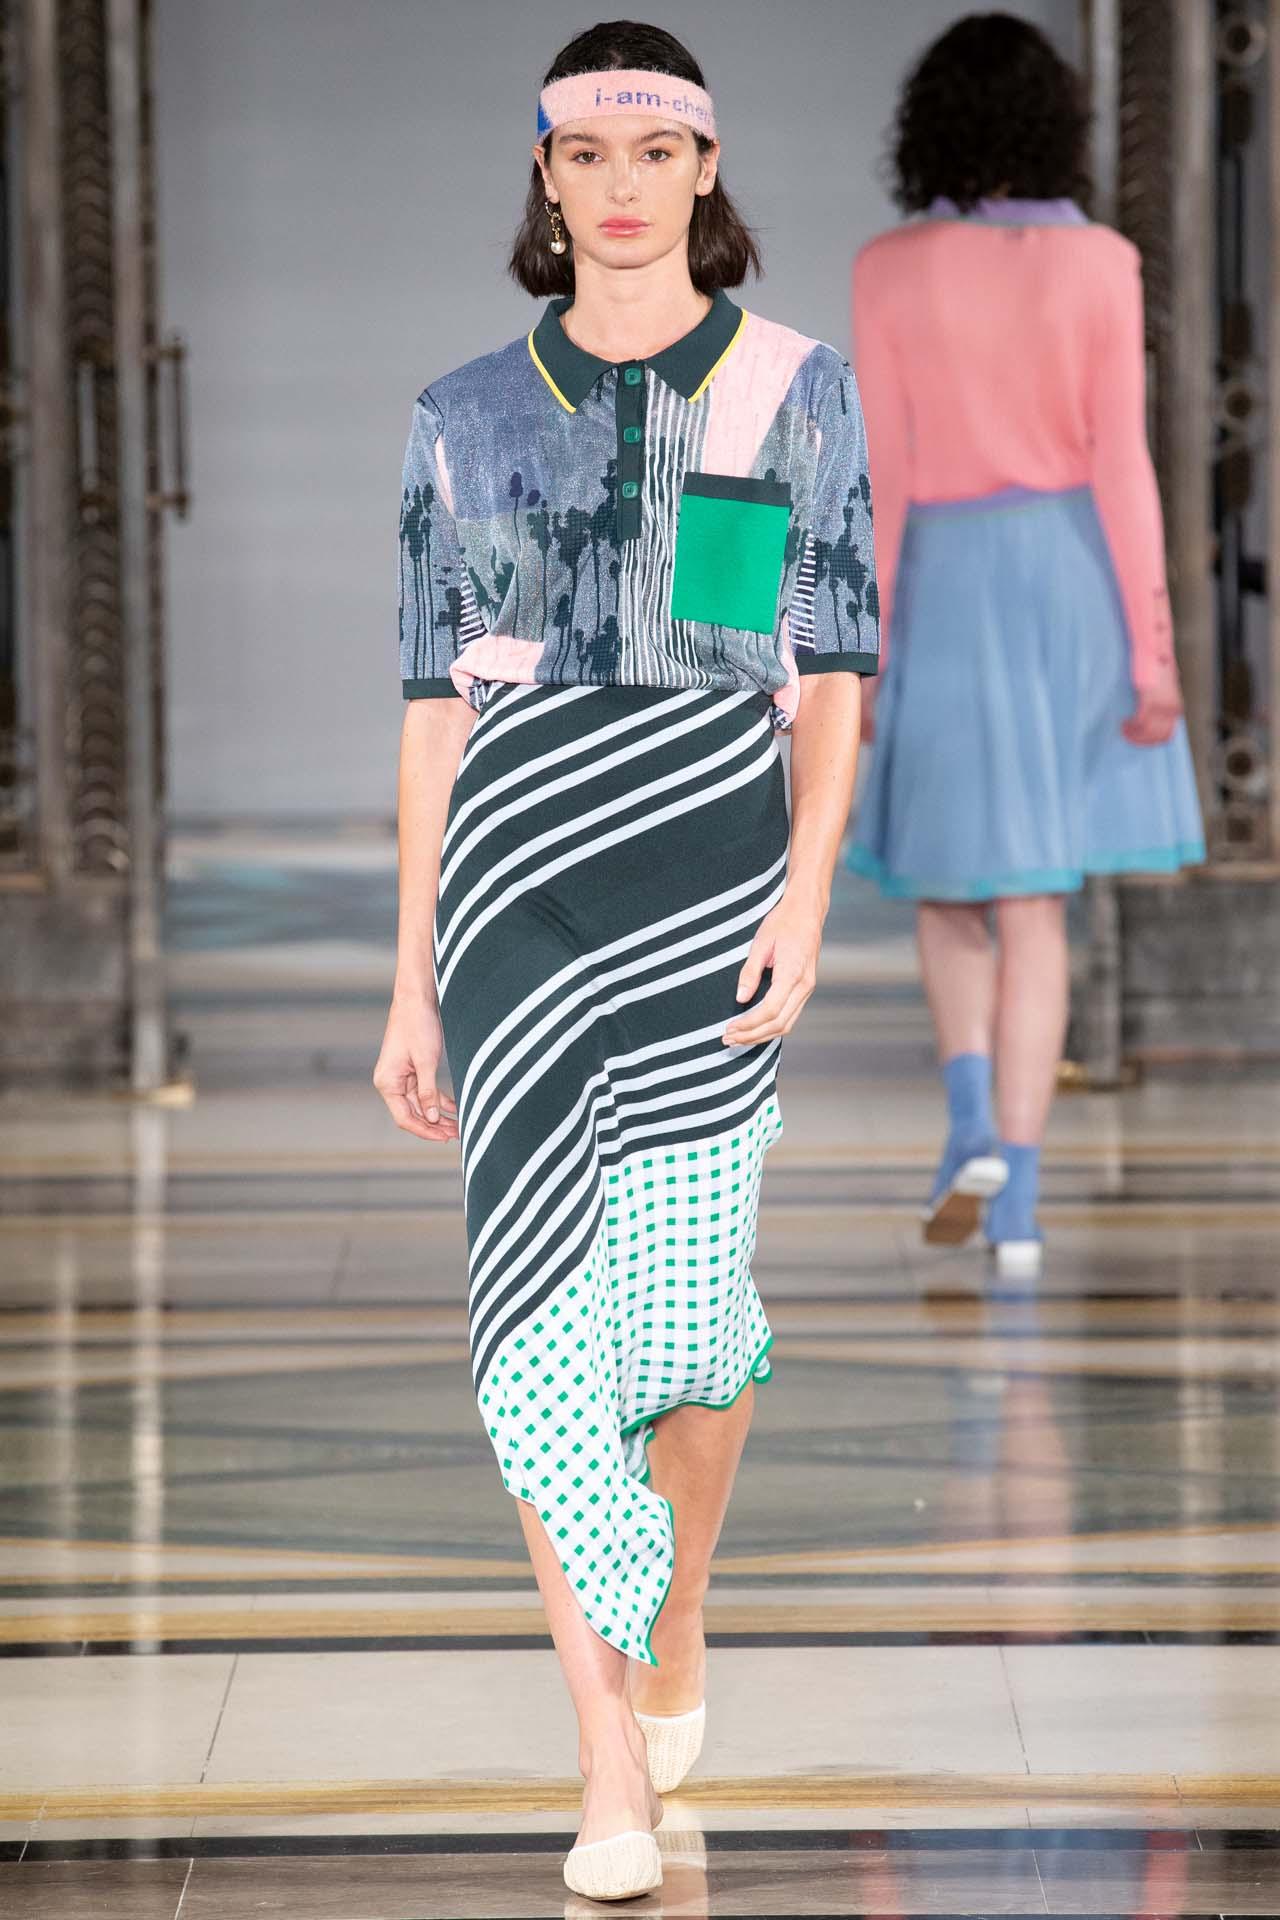 Fashion scout merit award winner i am chen (12)